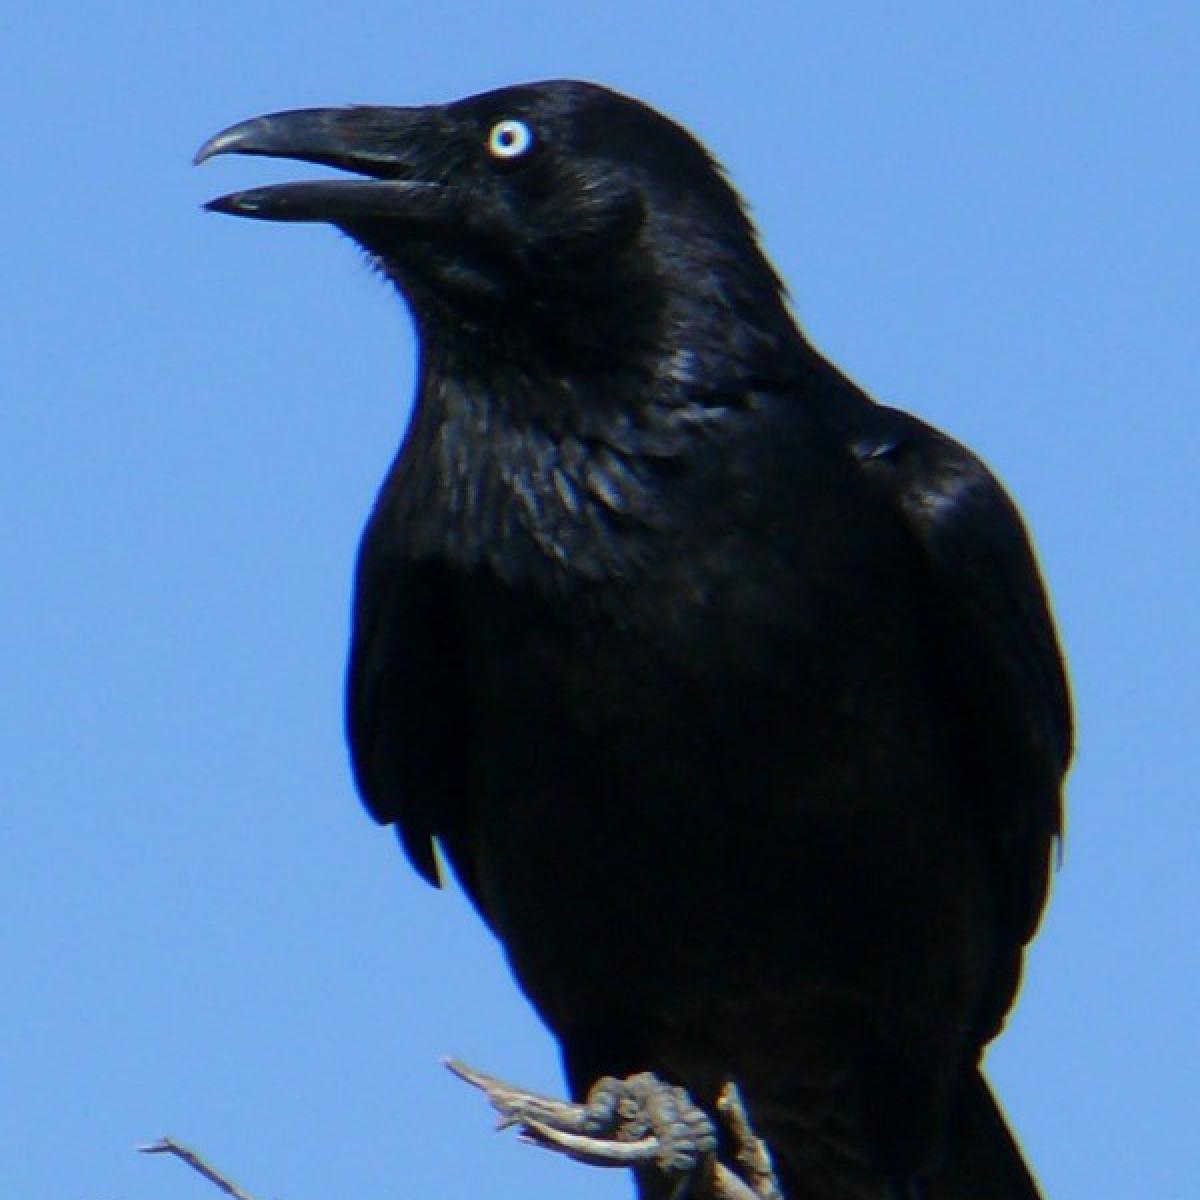 808 Australian Raven